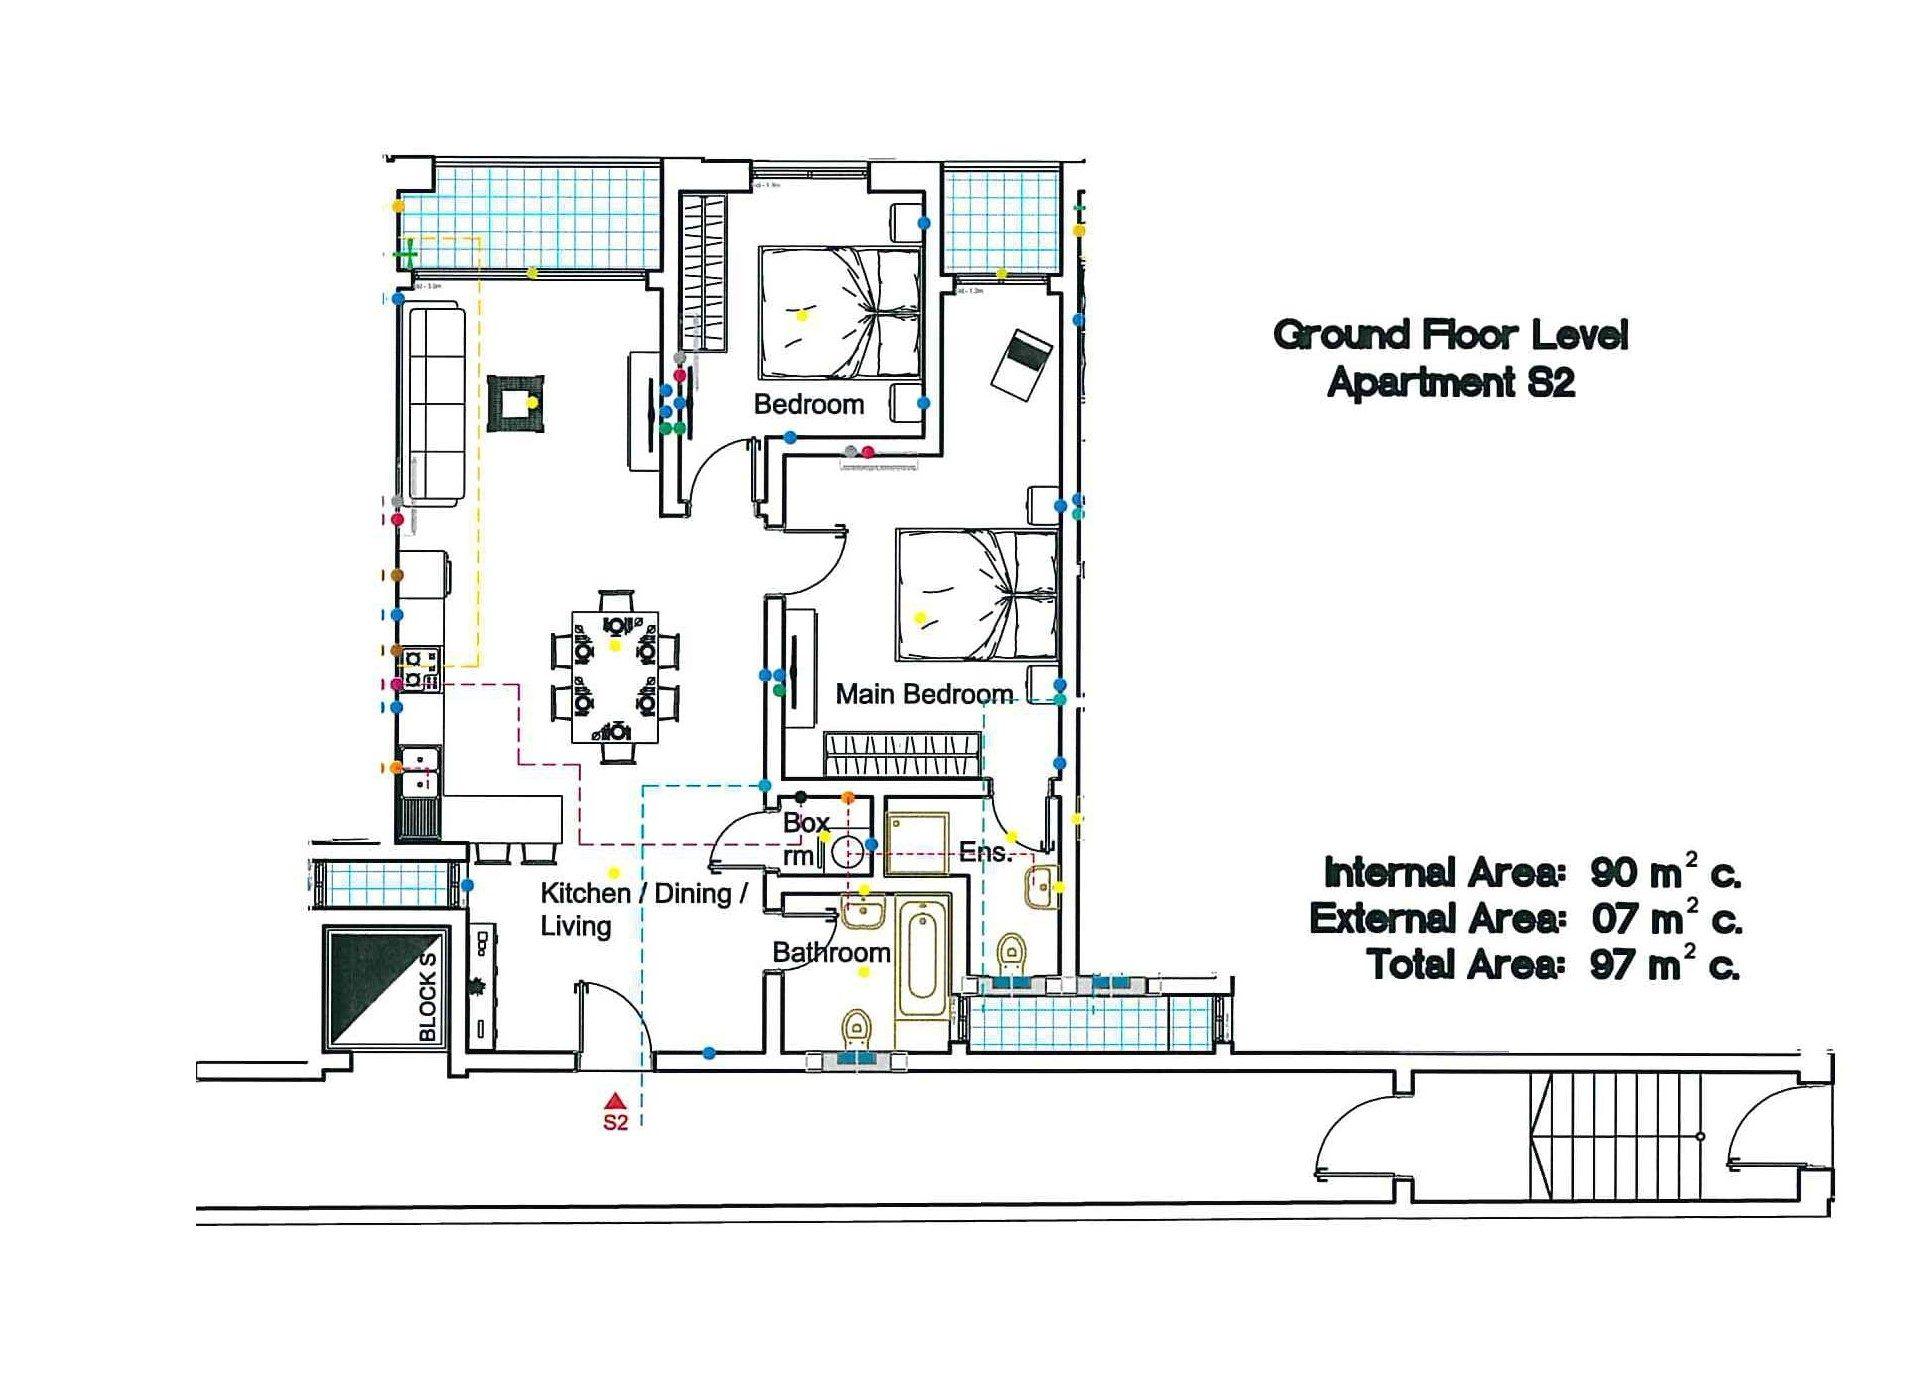 S2 Ground Floor